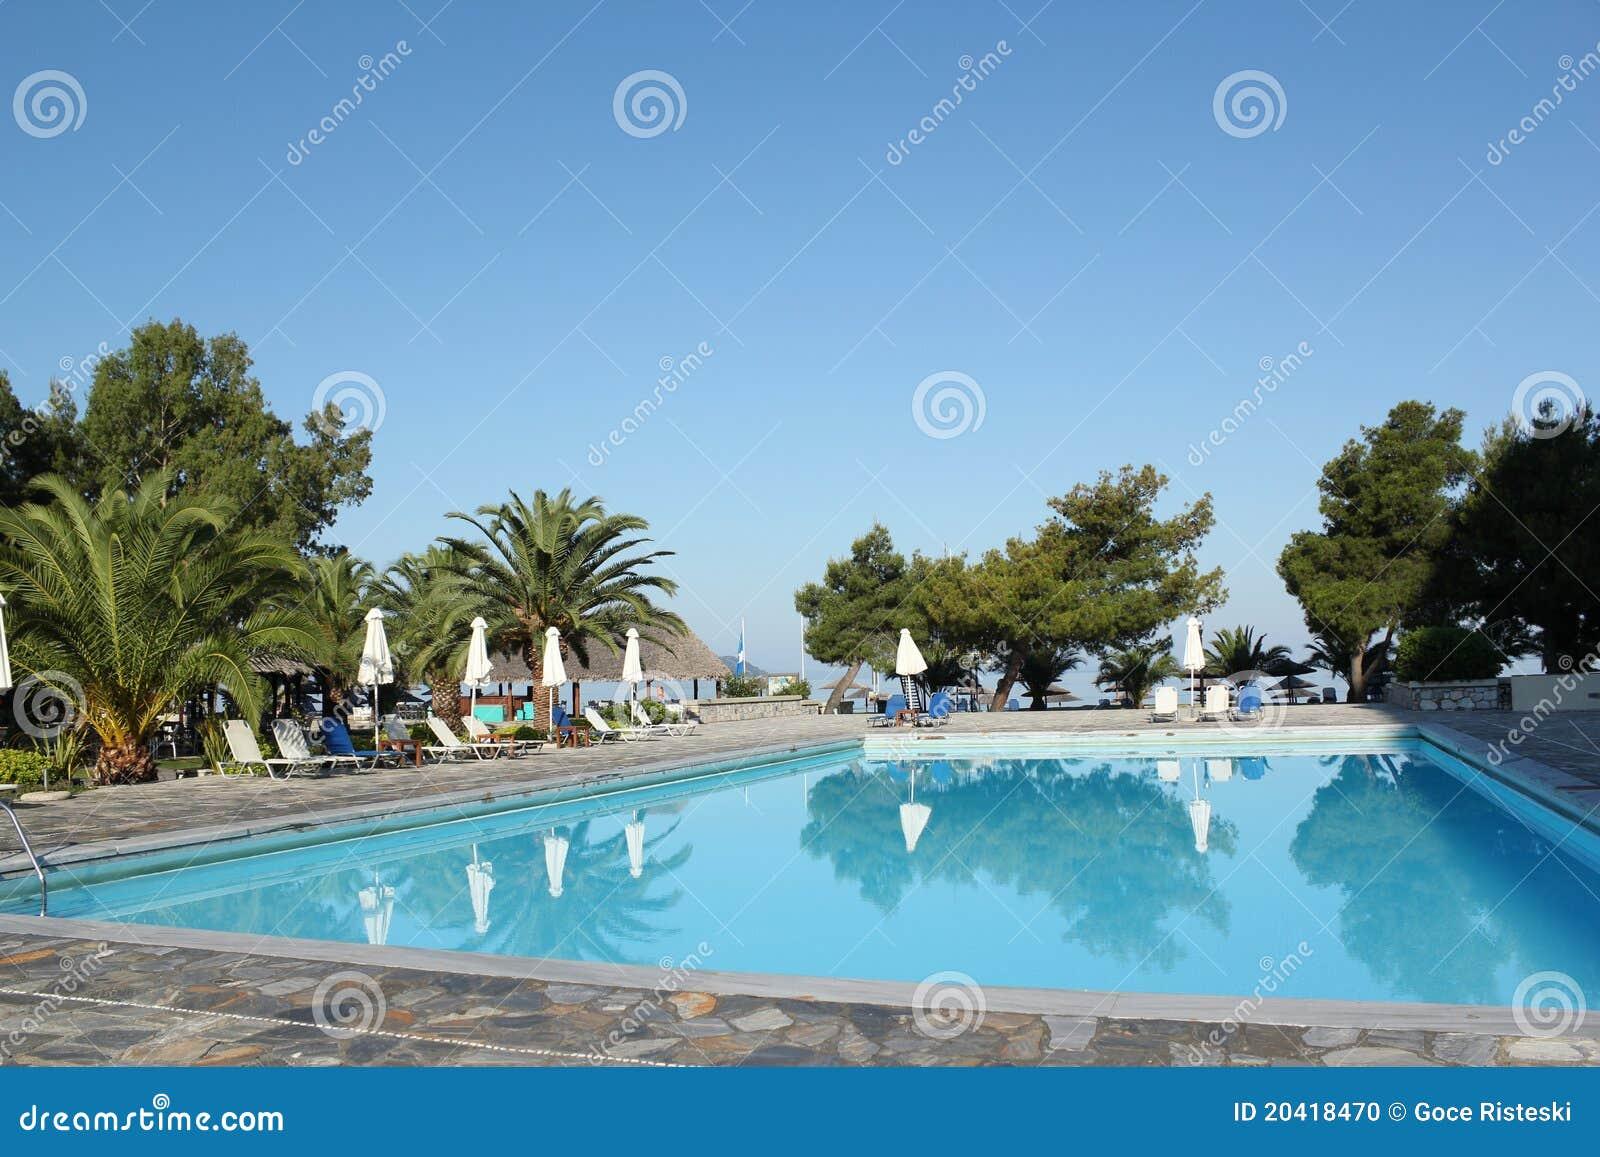 Swimming Pool Vacation Scene Stock Photo Image 20418470